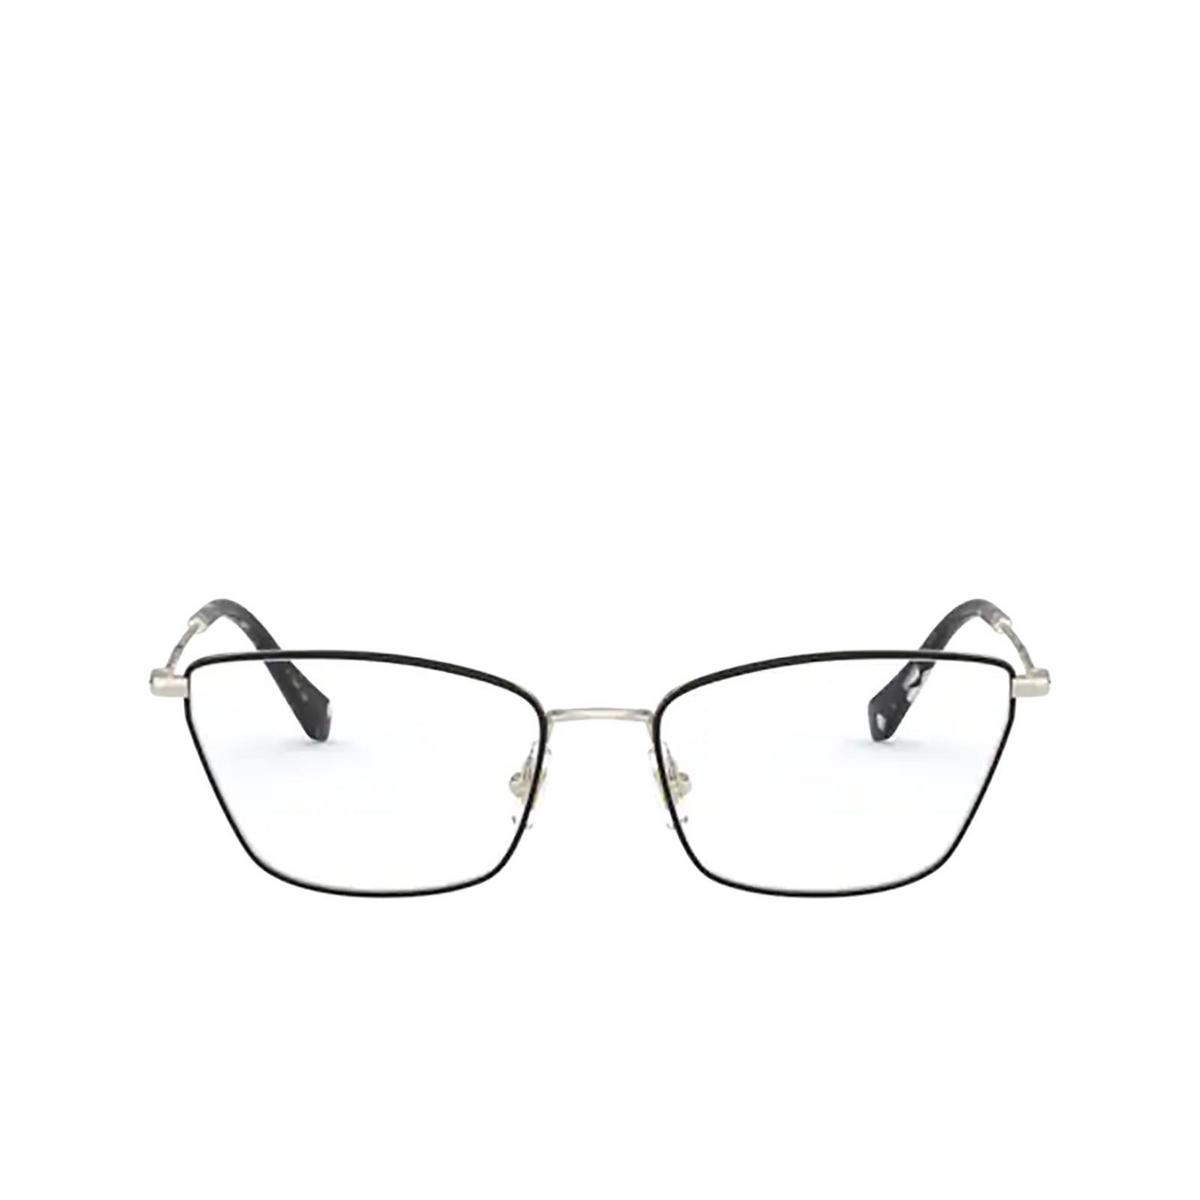 Miu Miu® Cat-eye Eyeglasses: MU 52SV color Pale Gold / Black AAV1O1 - front view.